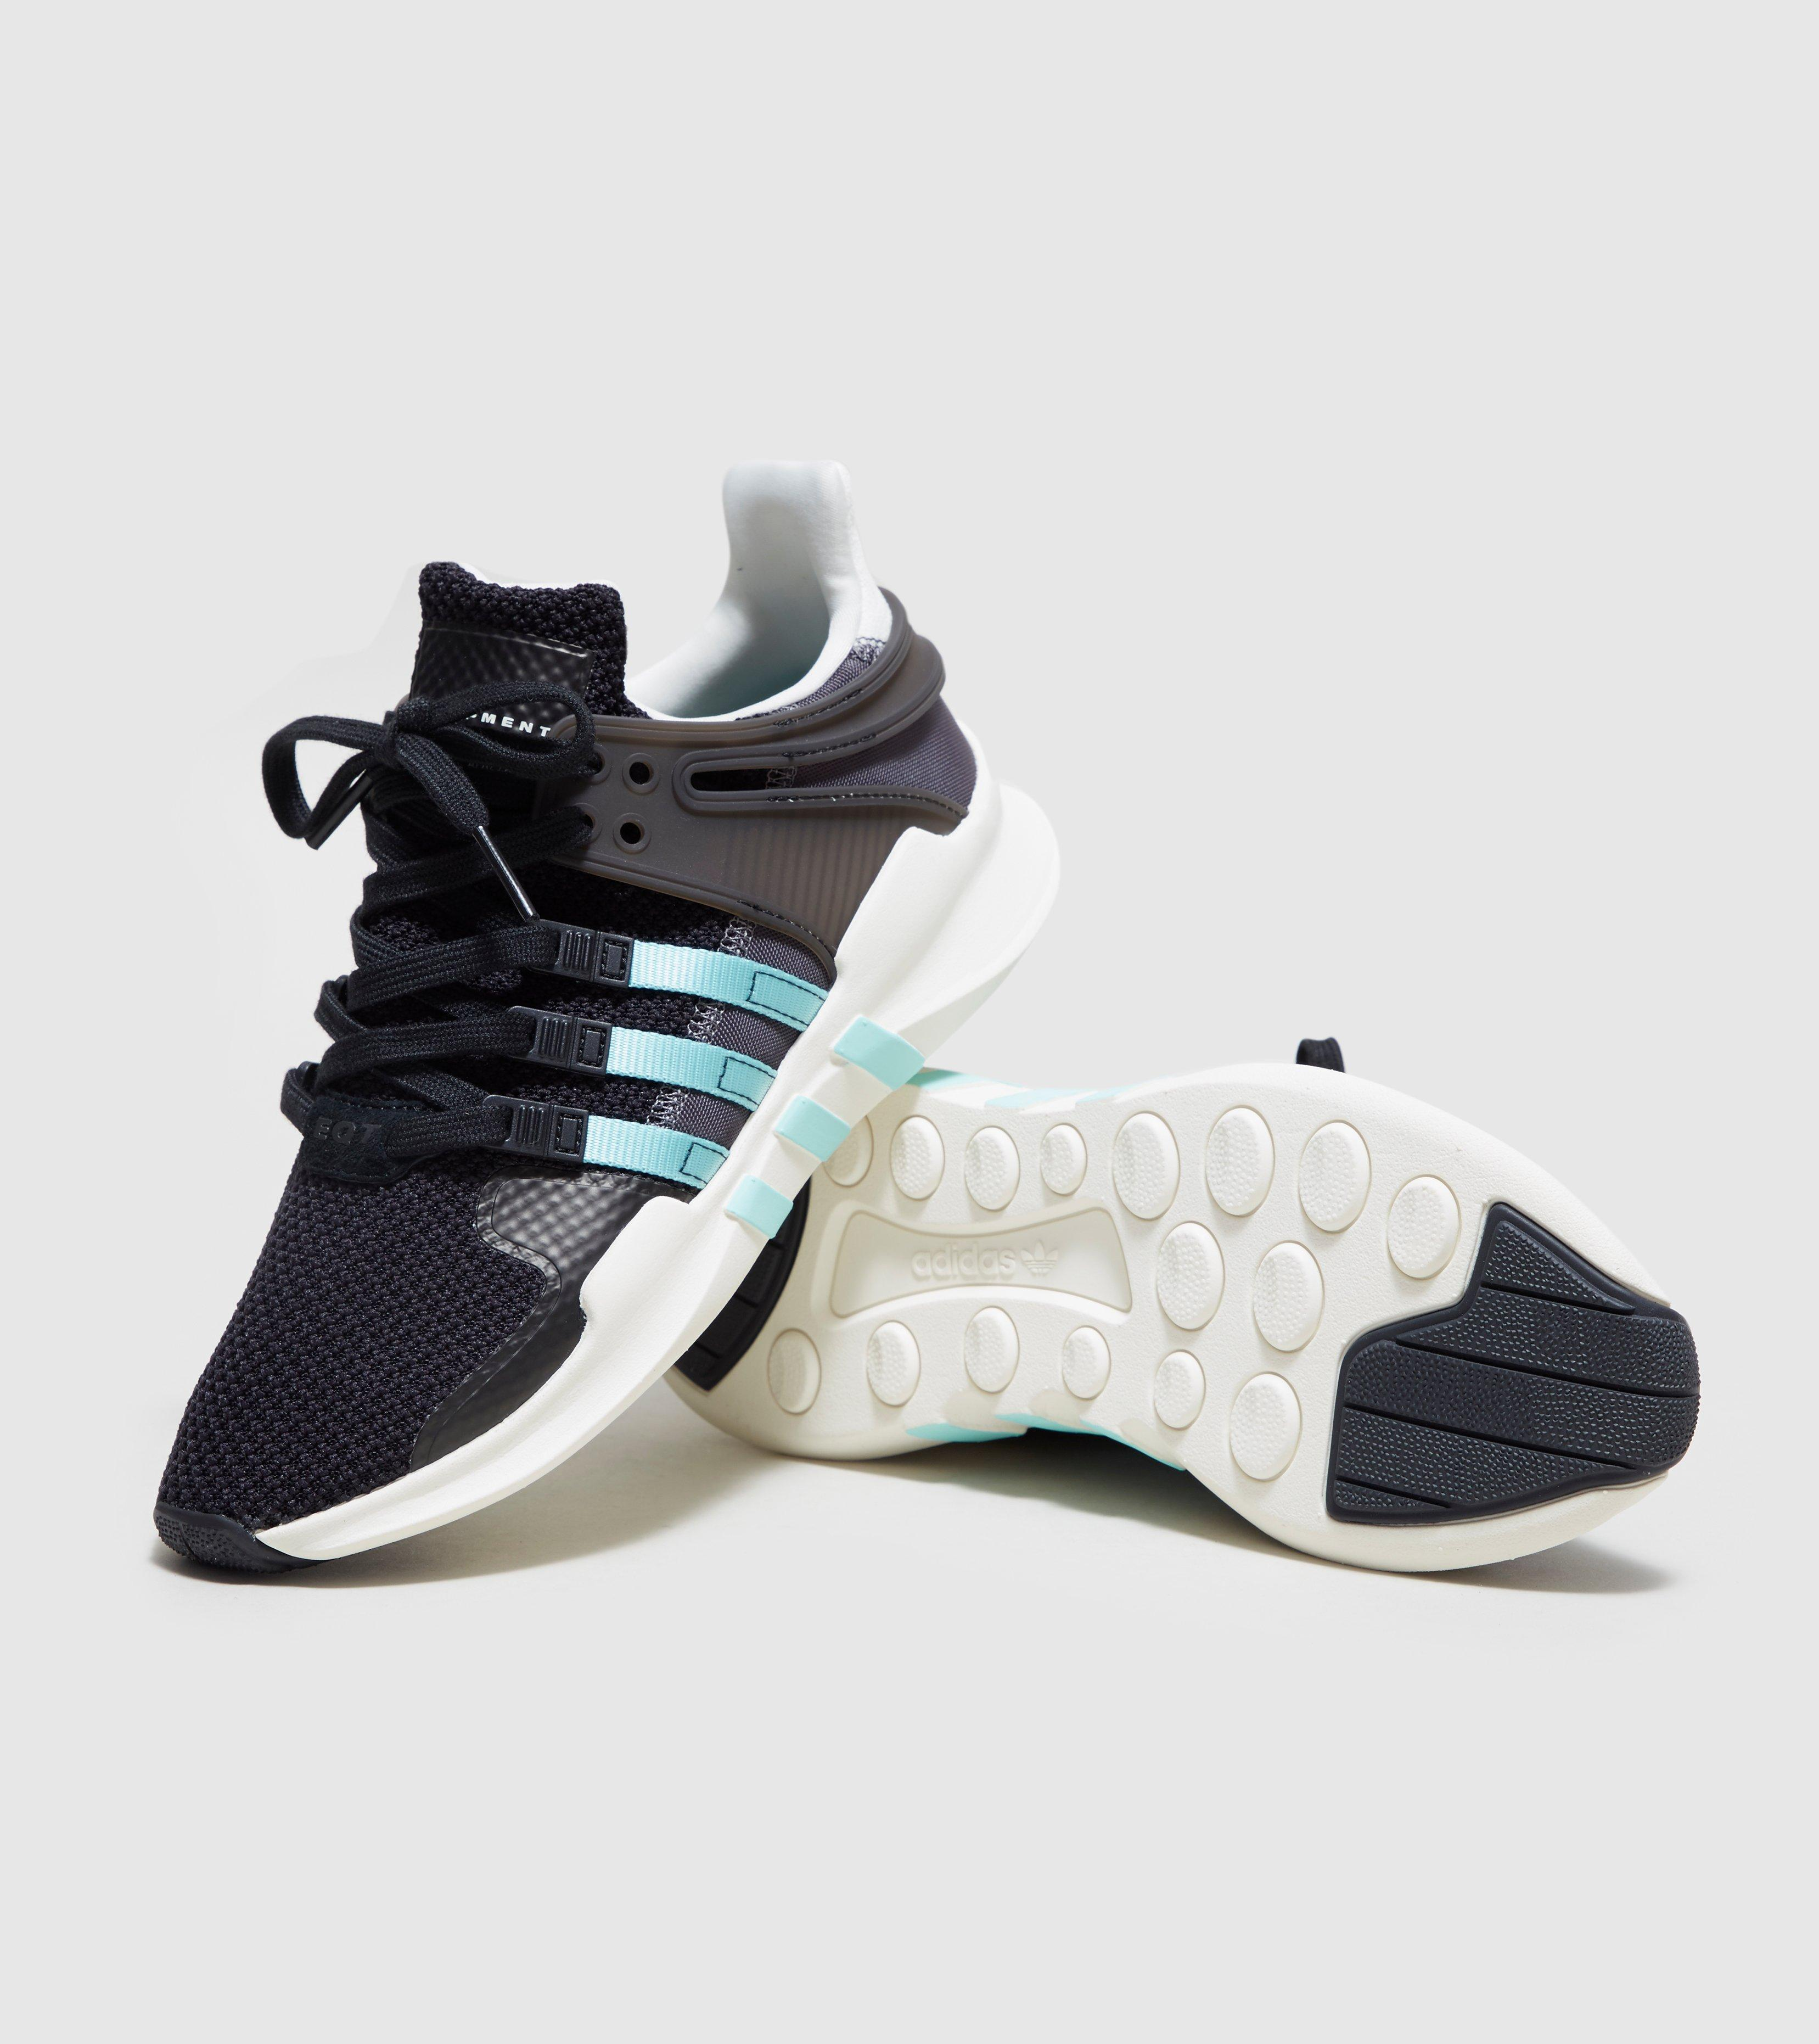 6caa43bb9 Lyst - Adidas Originals Eqt Support Adv Women s in Black